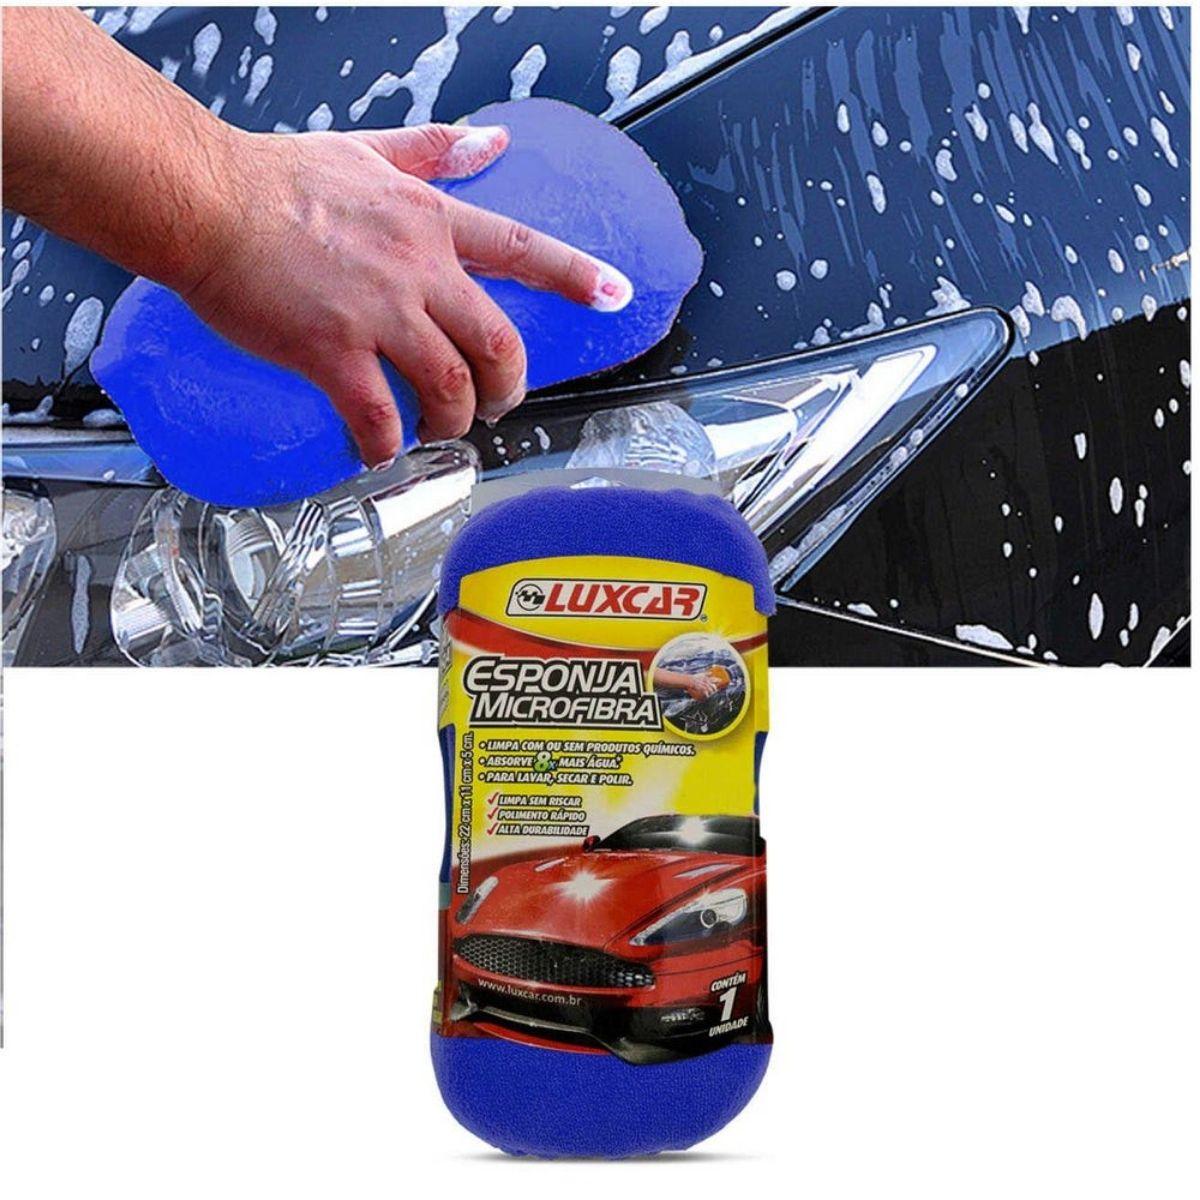 Esponja Microfibra Para Lavar Carros Luxcar